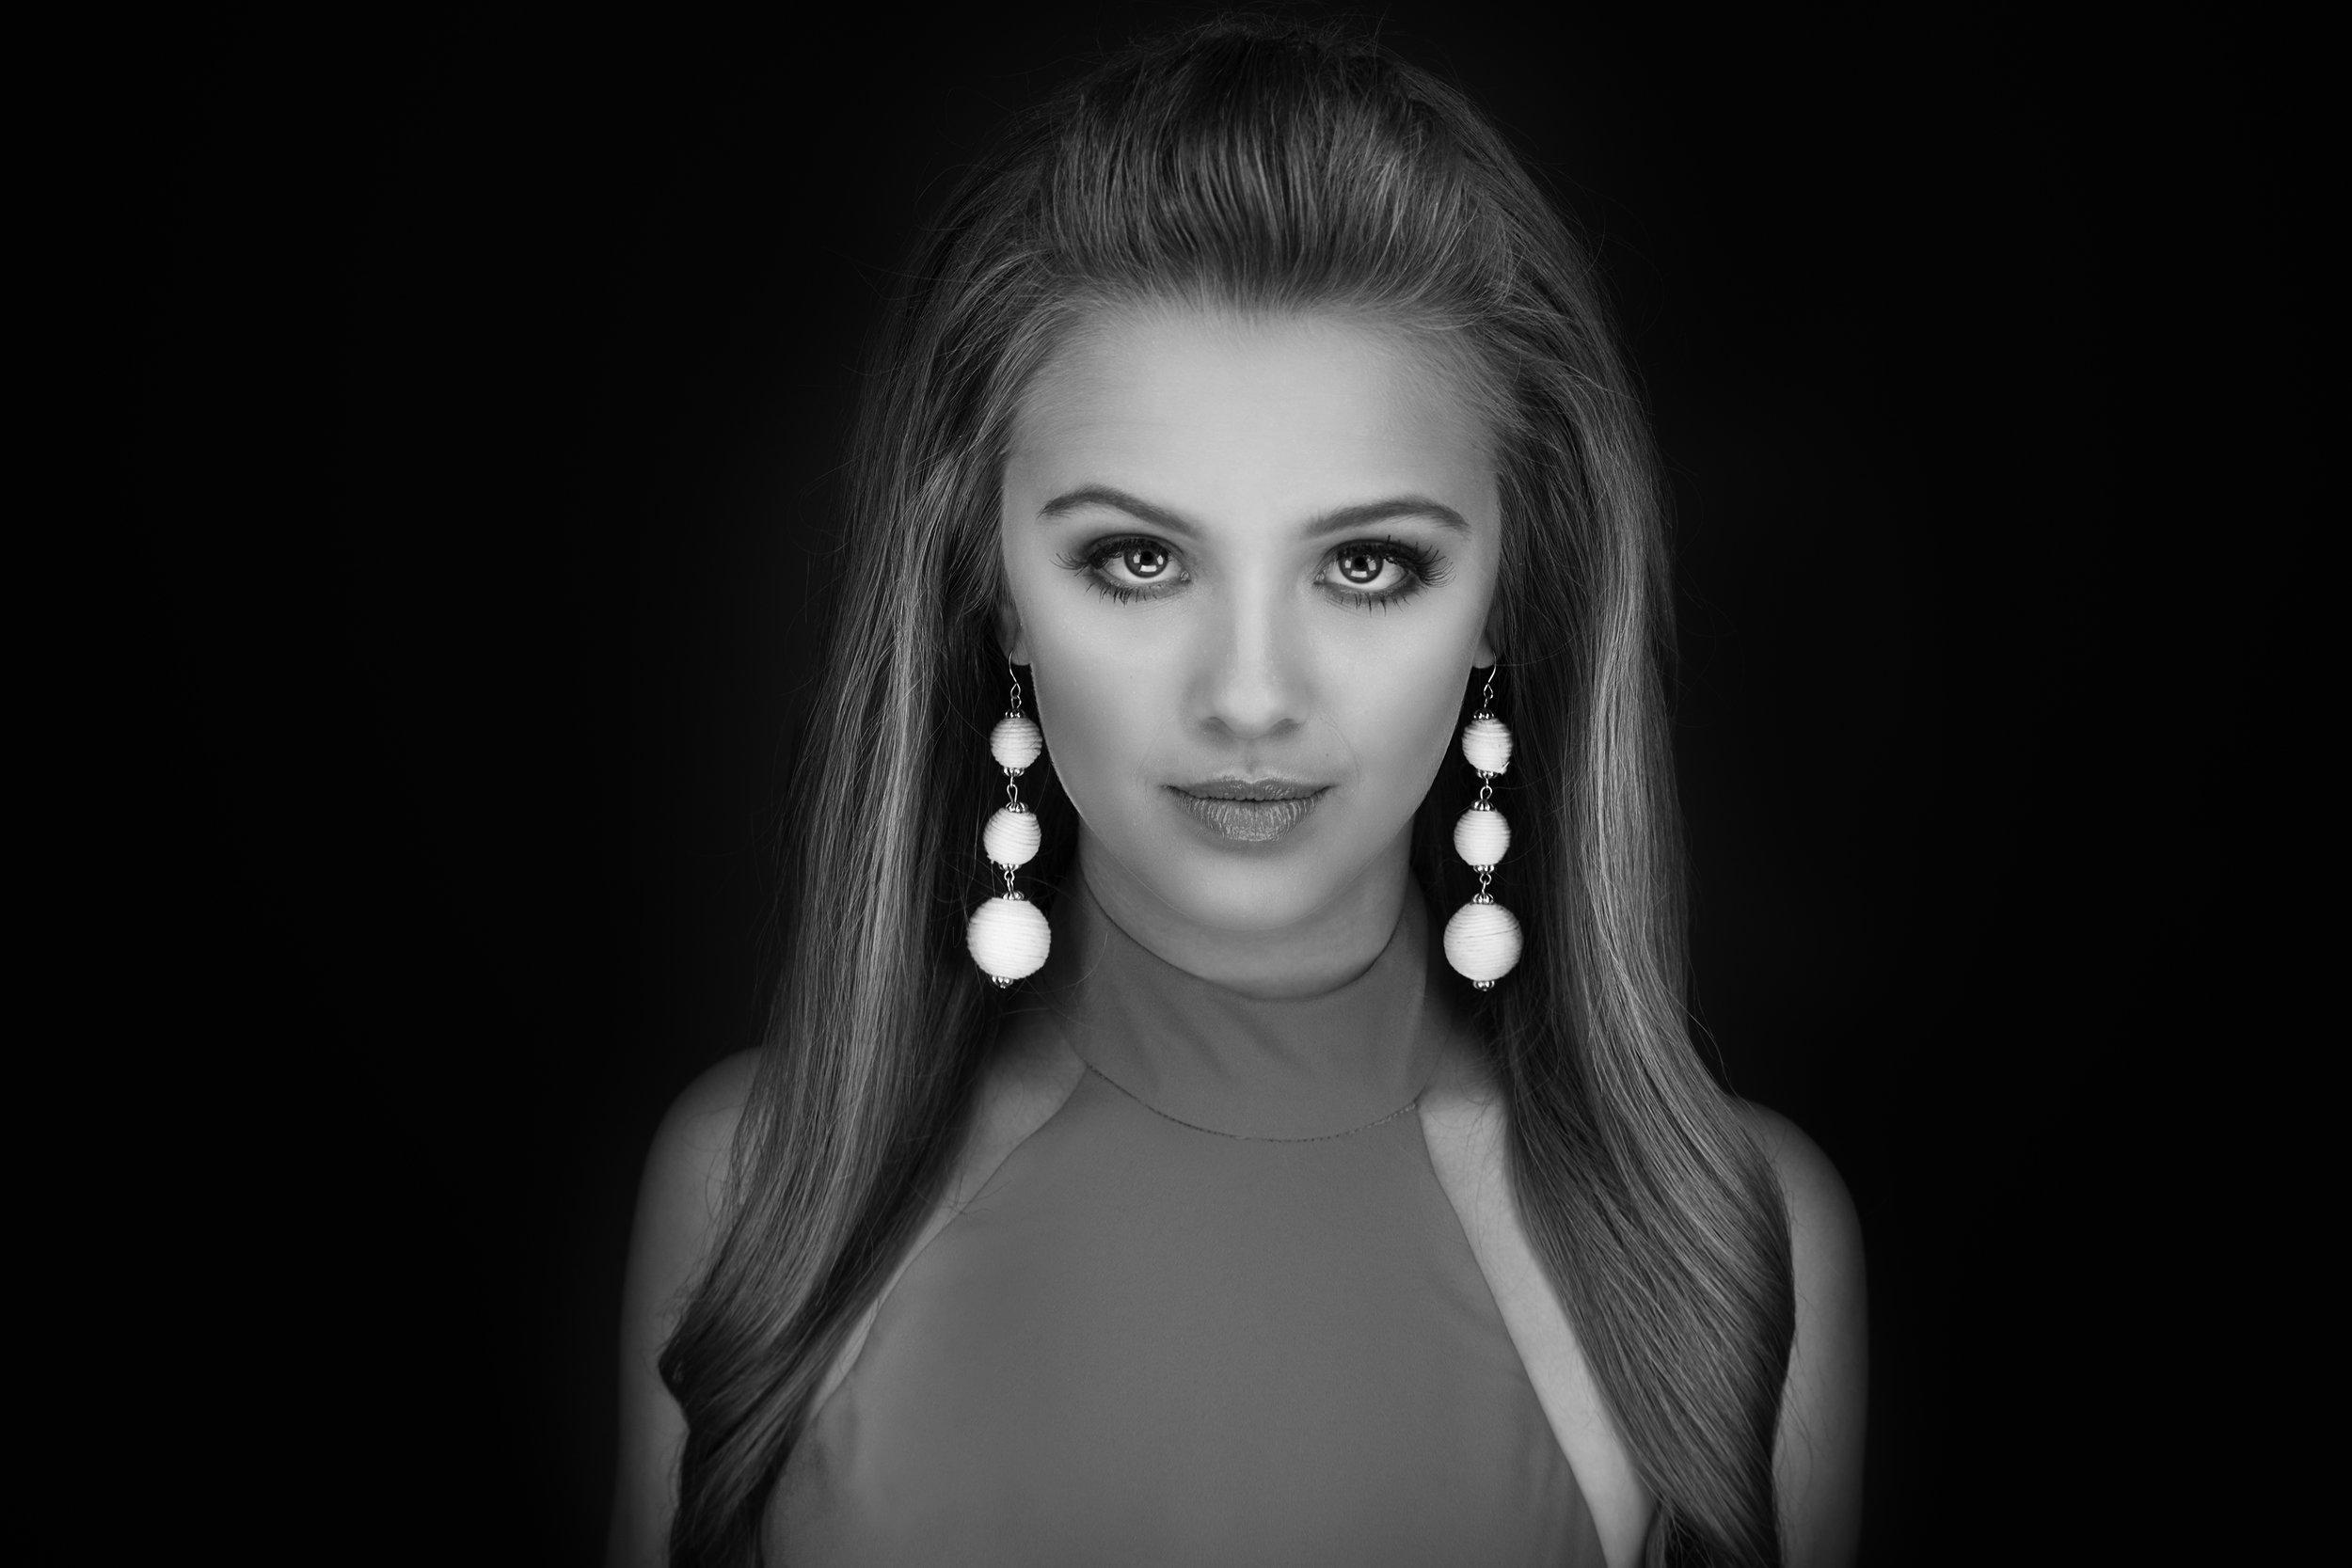 Black_White_headshot_fashion_pageant_Miss_arkansas_jr_high_america_jodie_Kelly_photography.jpg